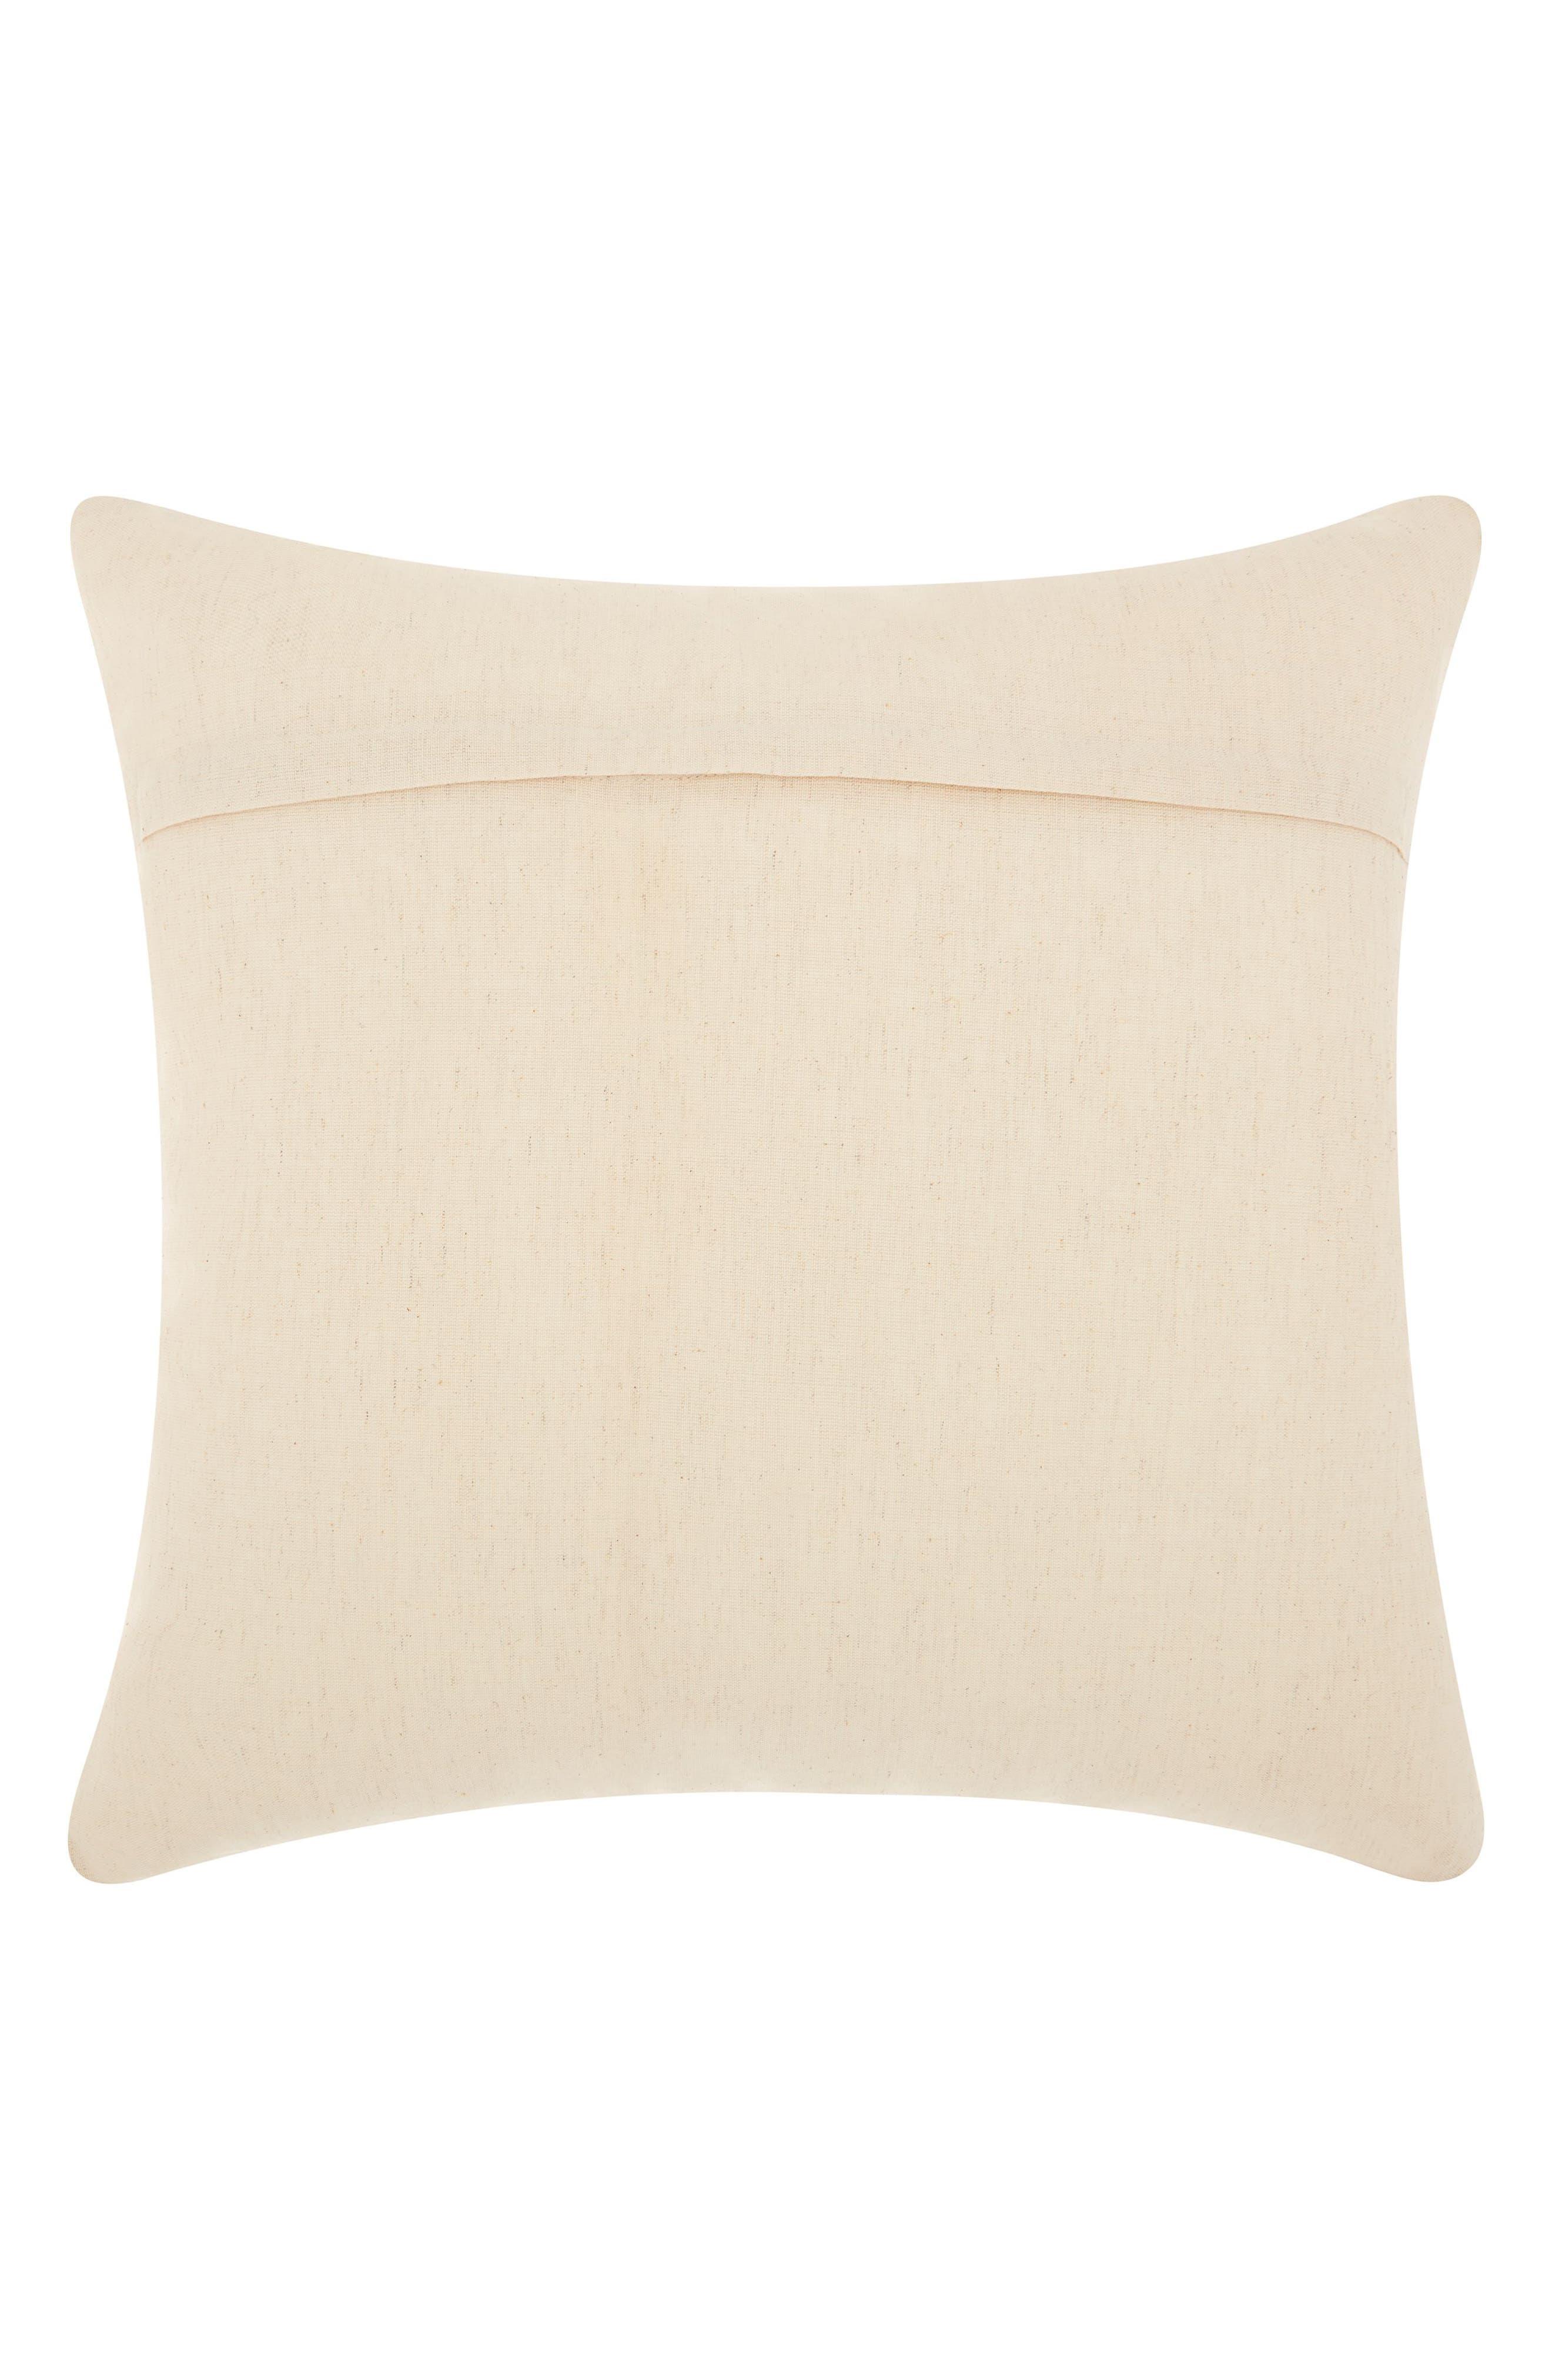 Cool Pitbull Accent Pillow,                             Alternate thumbnail 2, color,                             250